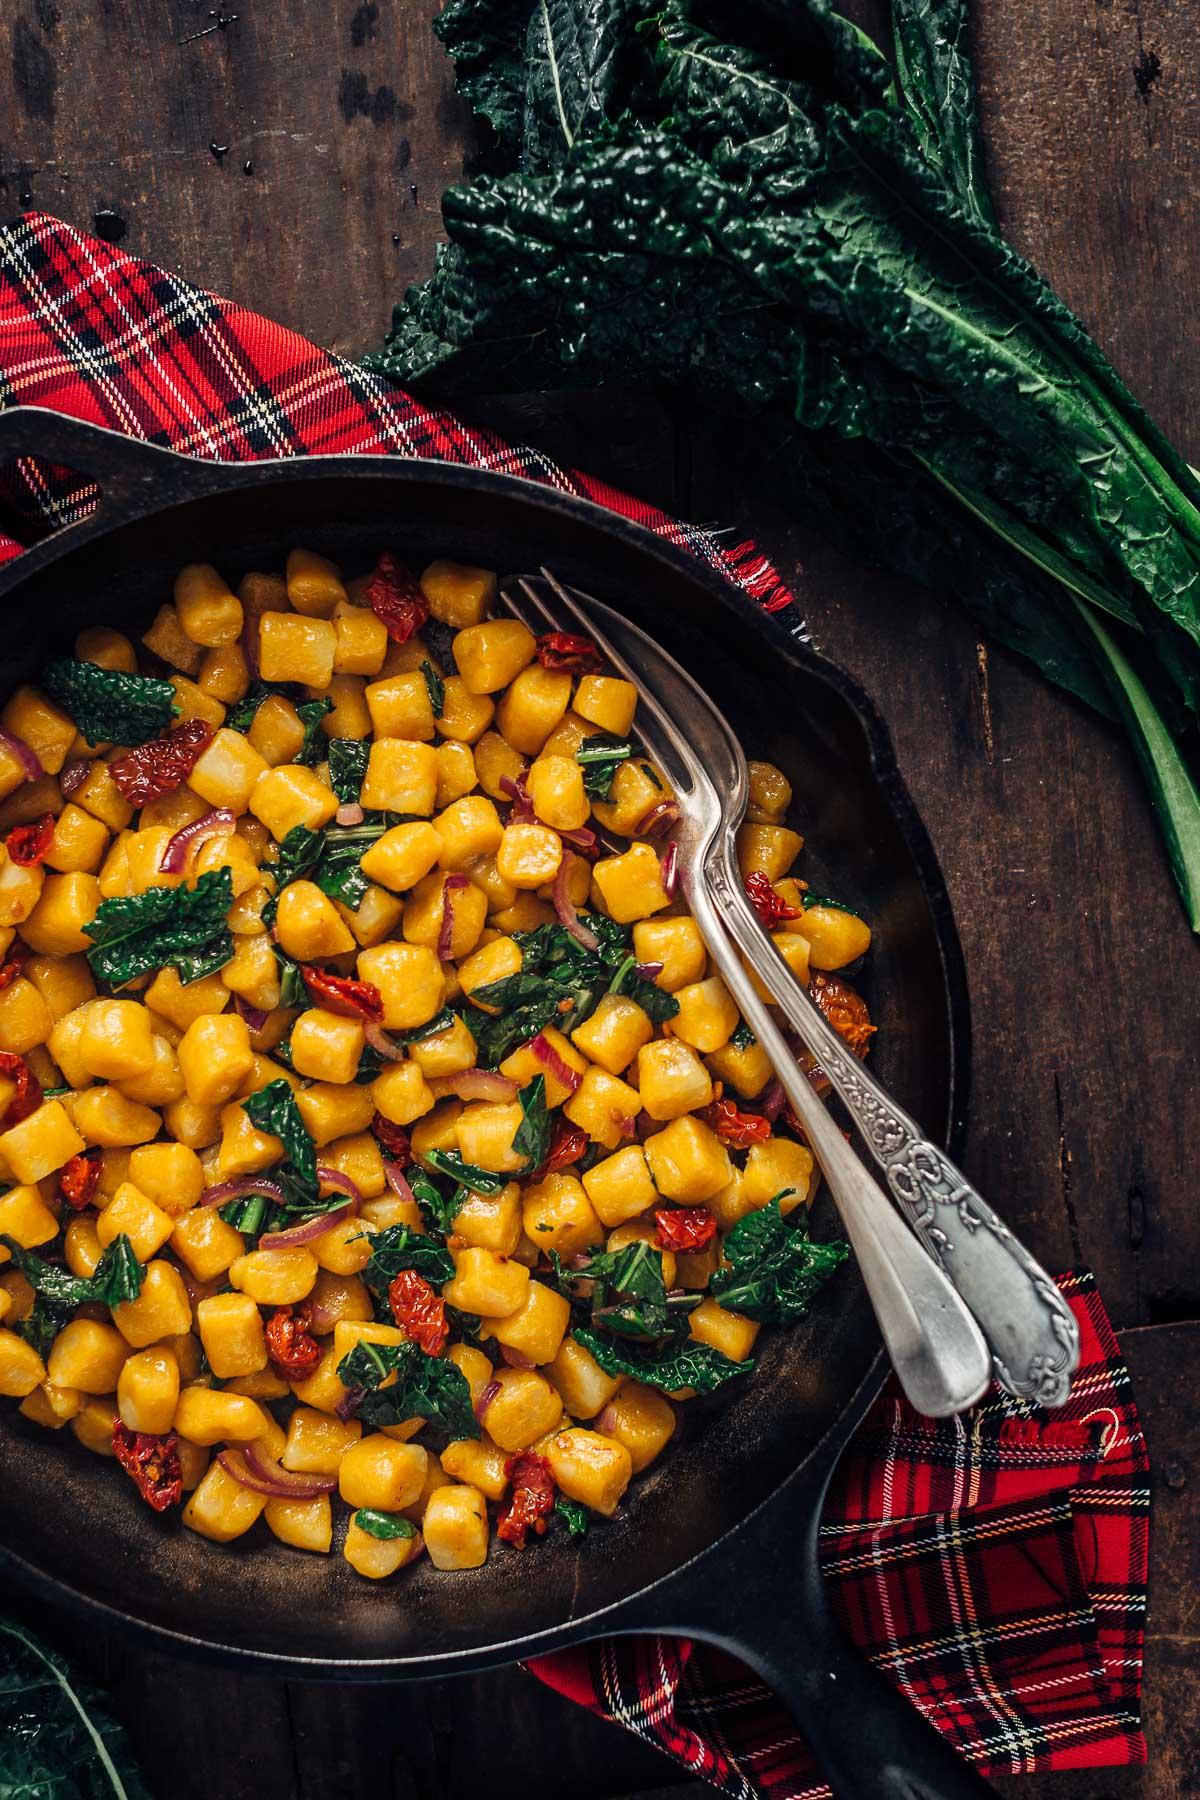 easy homemade #vegan #glutenfree PUMPKIN GNOCCHI recipe with kale - GNOCCHI alla ZUCCA vegan senza glutine - ricetta facile #vegan #gnocchi #pumpkin #senzaglutine